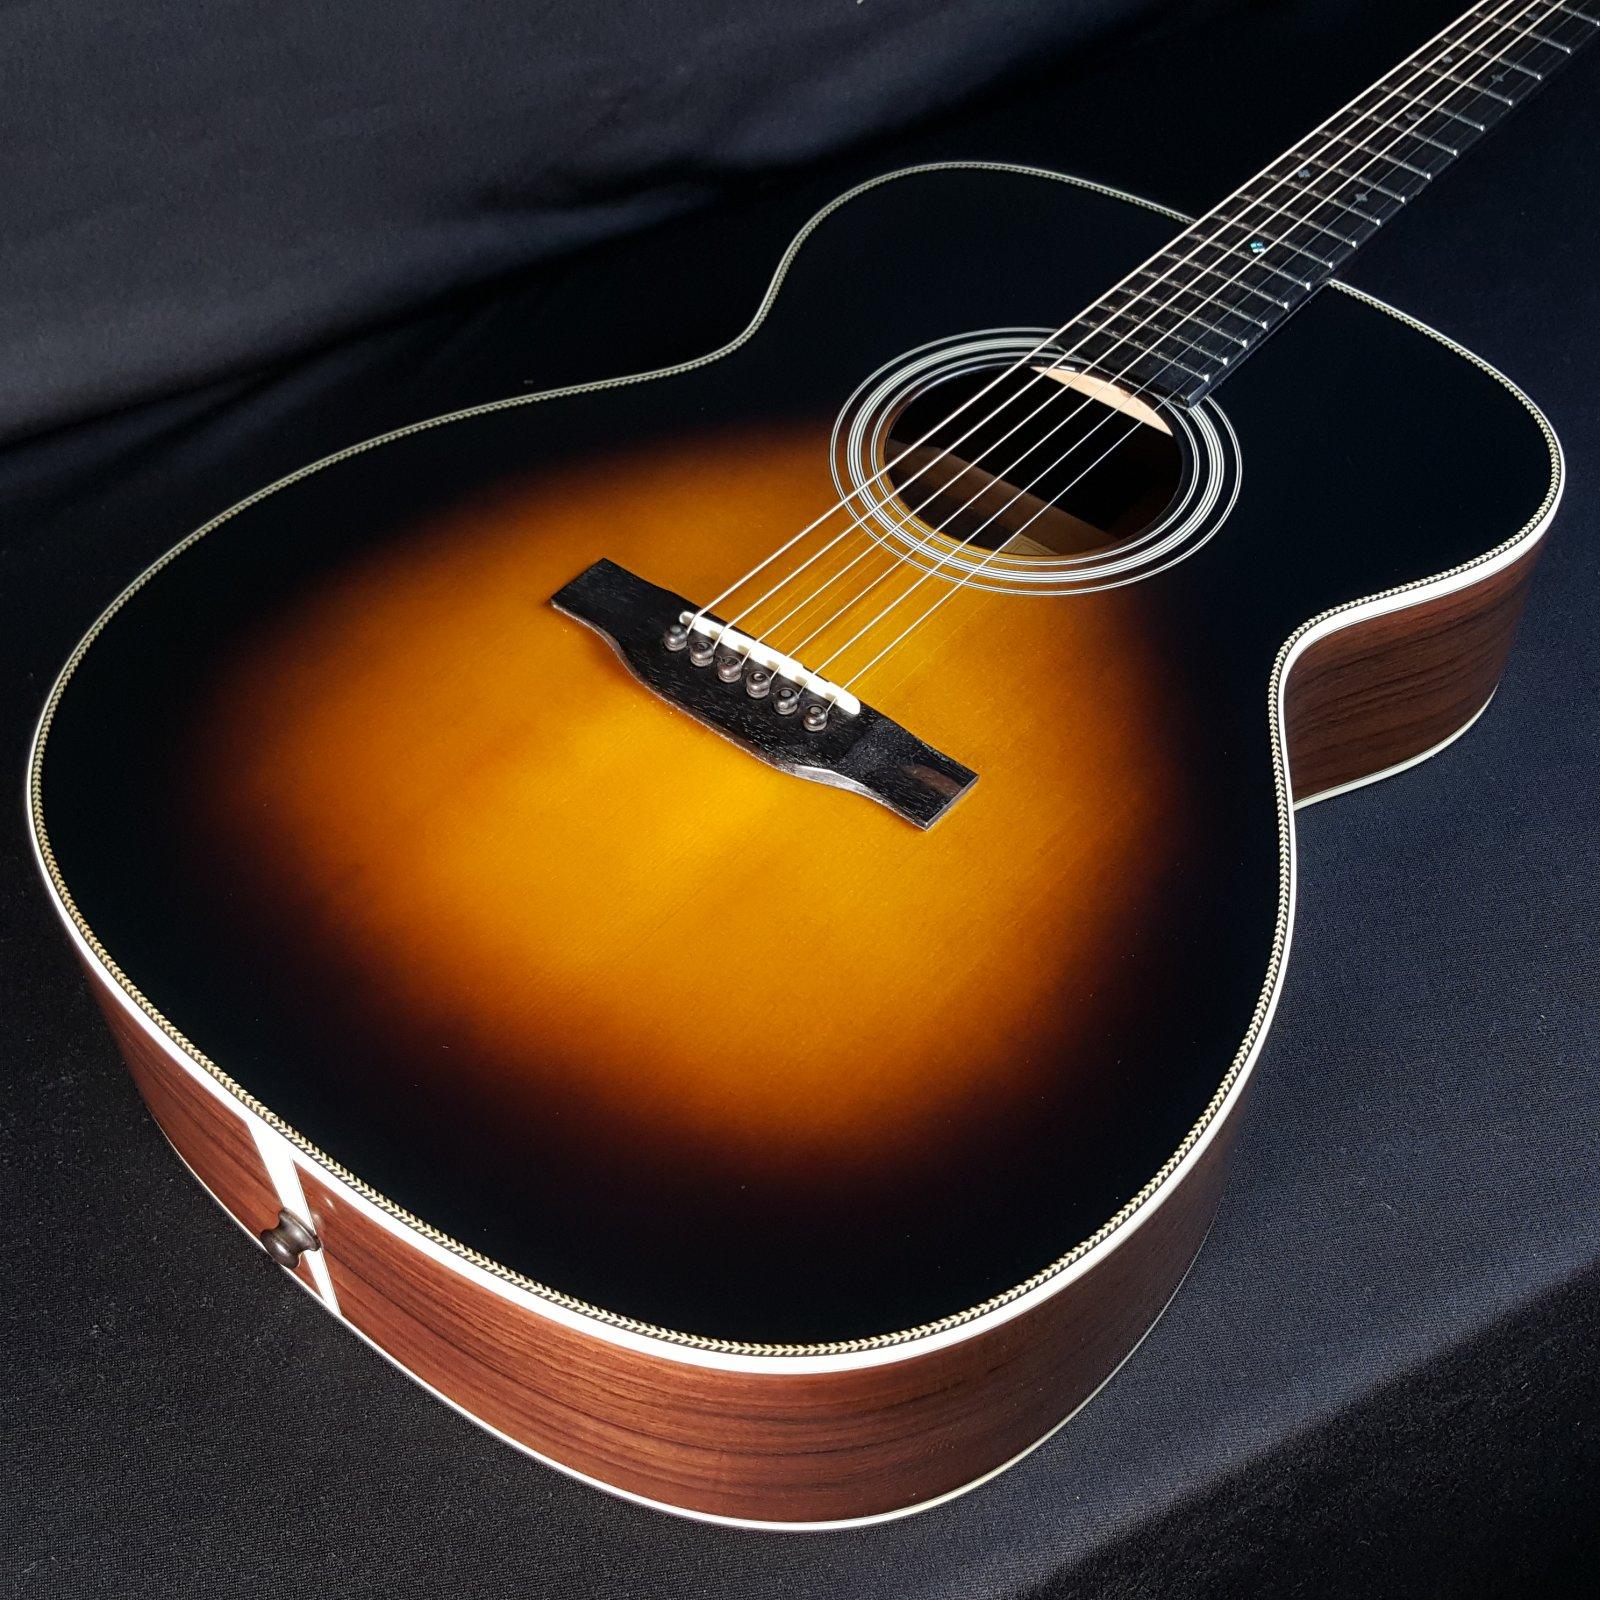 Eastman E20OM Sunburst Acoustic Guitar with Case & Optional Pickguard 5880